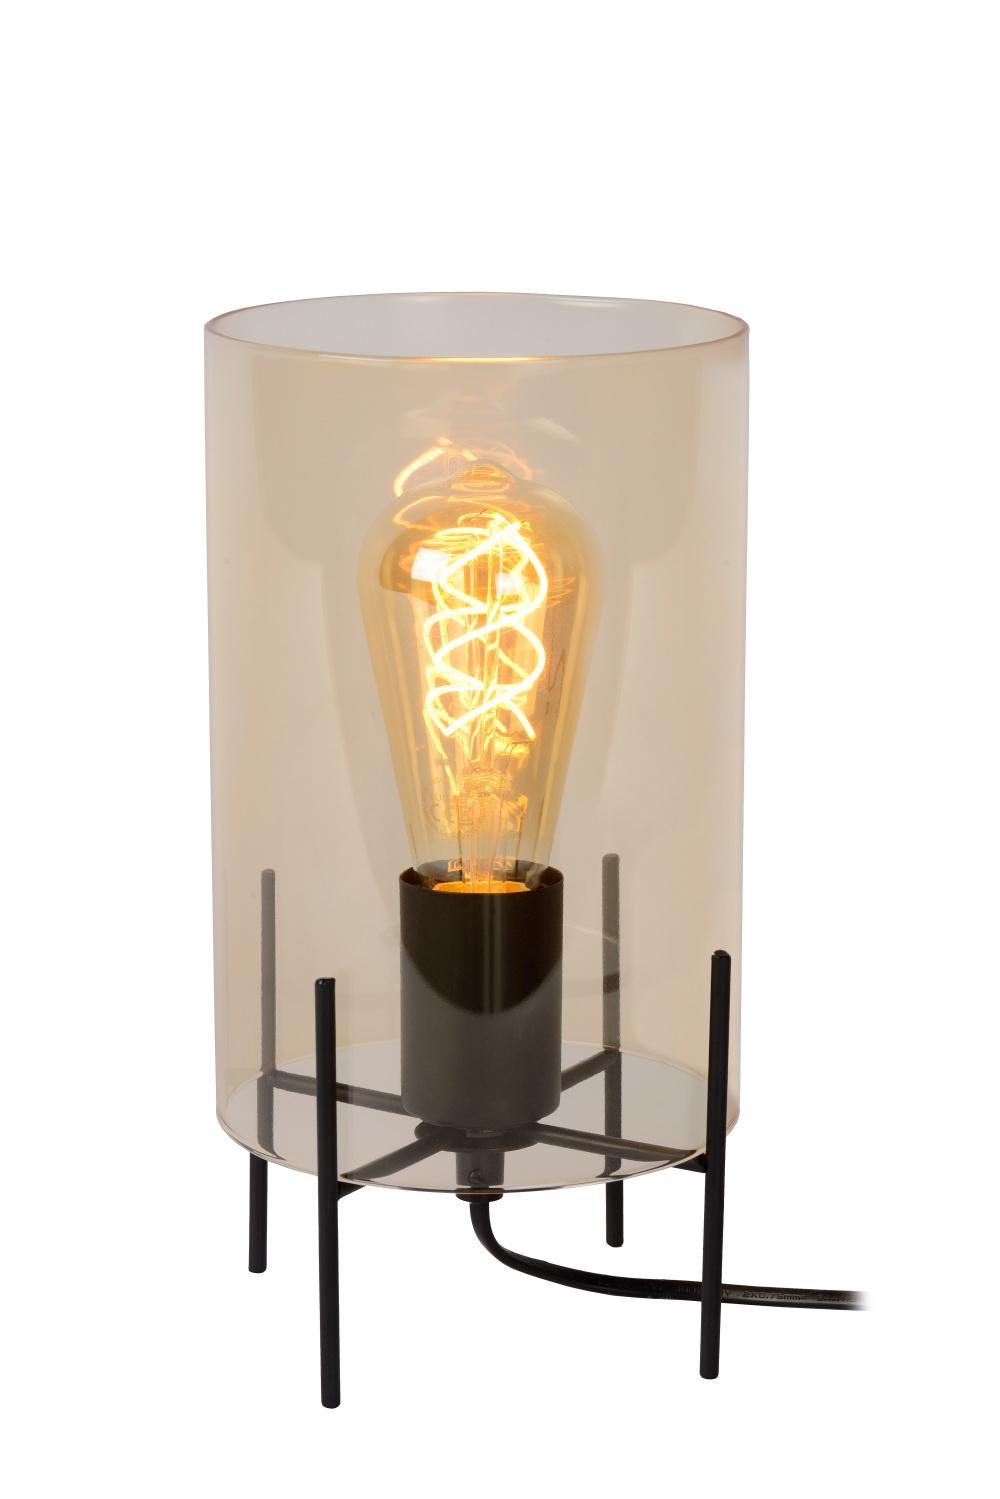 Lucide STEFFIE Tafellamp-Amber-Ø15,5-1xE27-40W-Glas